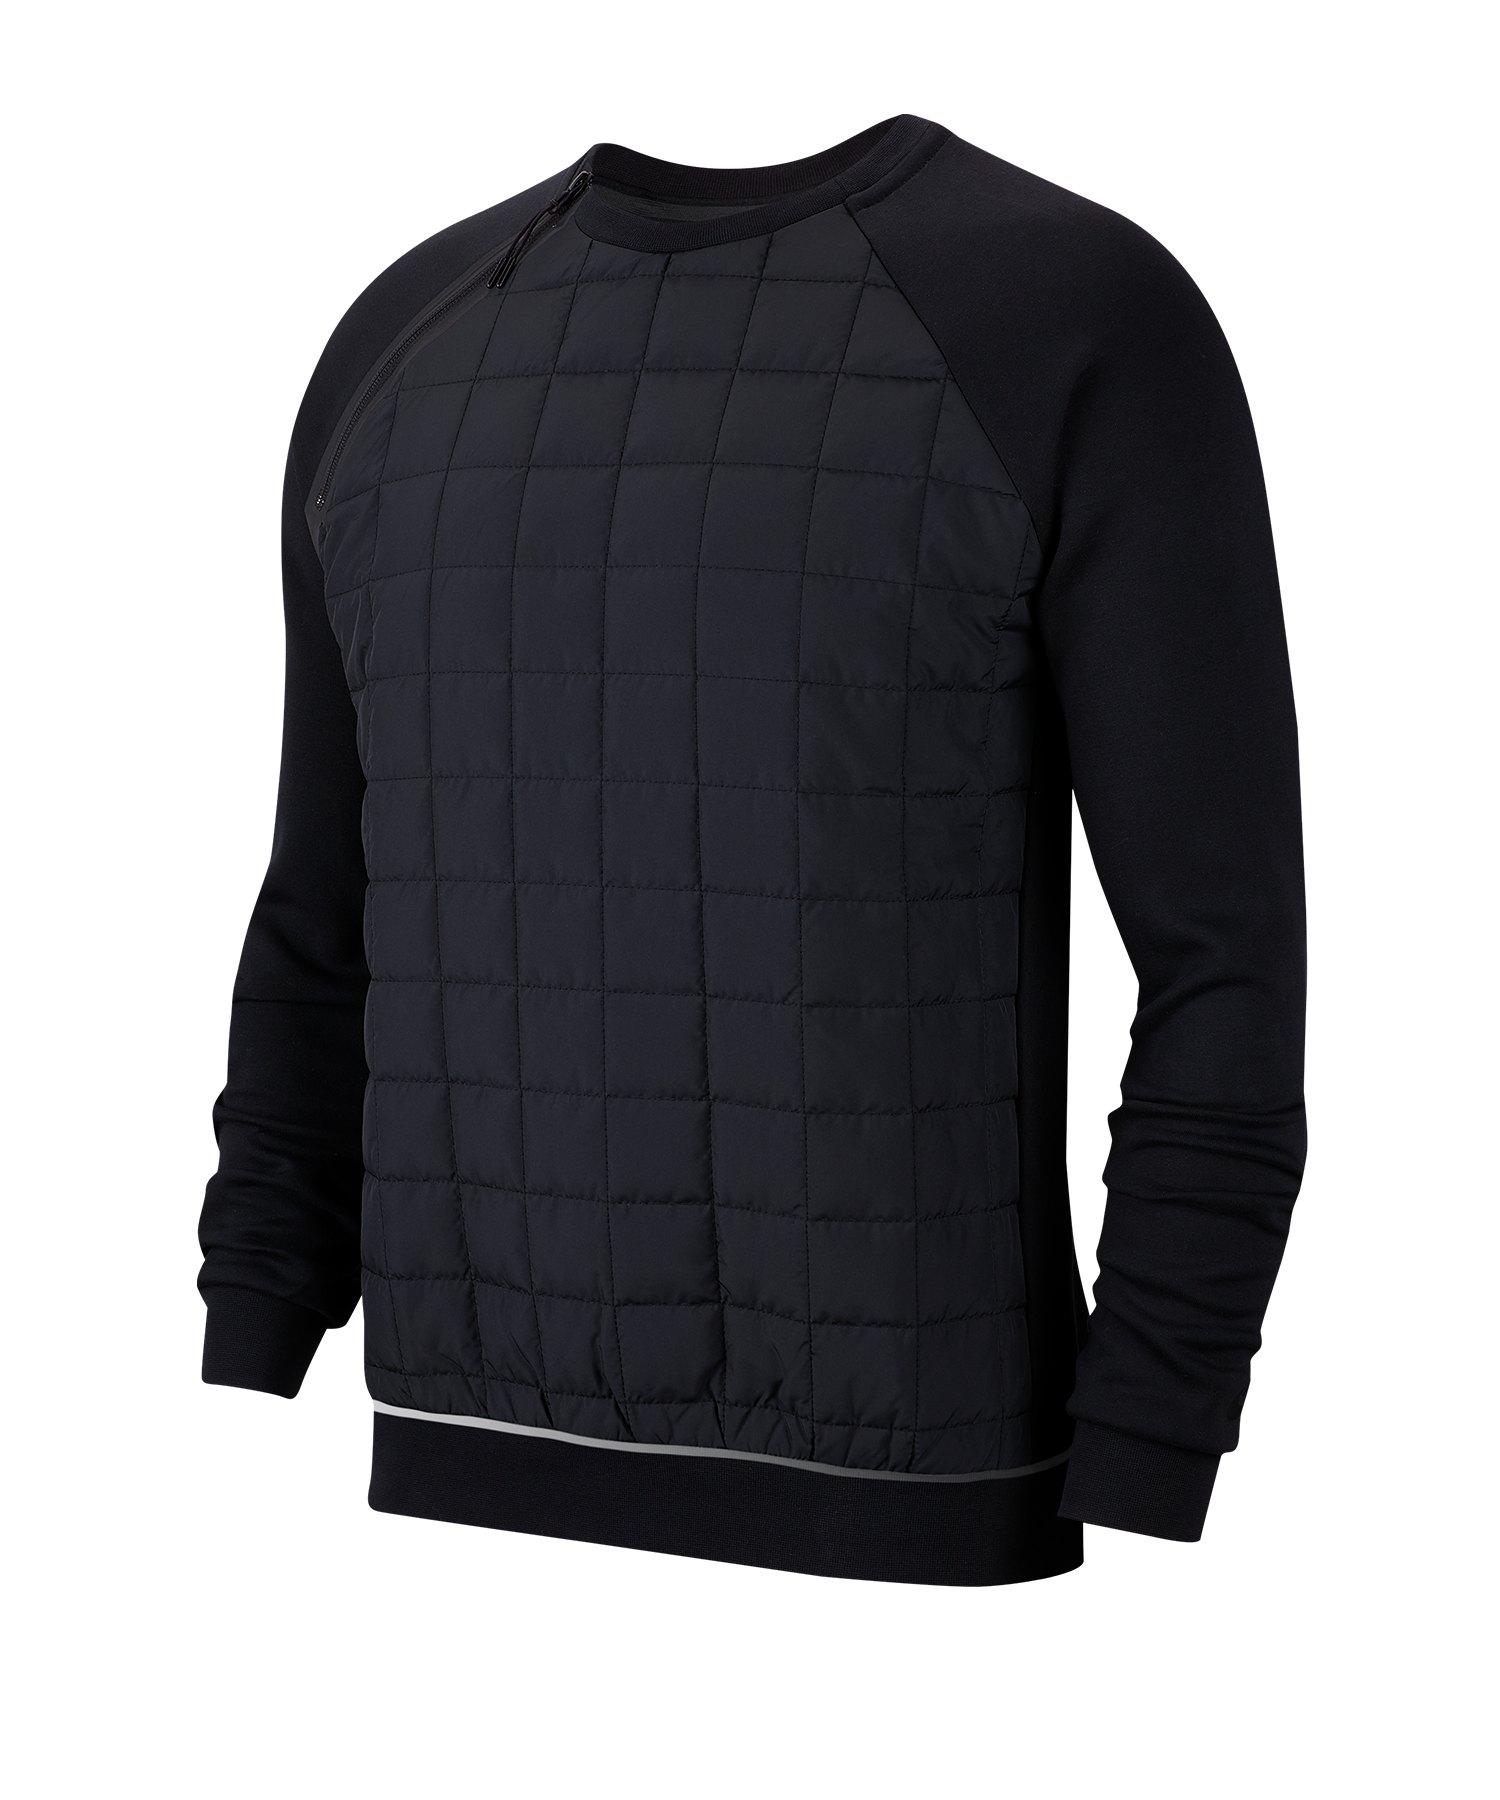 Nike Crew Sweatshirt Schwarz F010 - schwarz